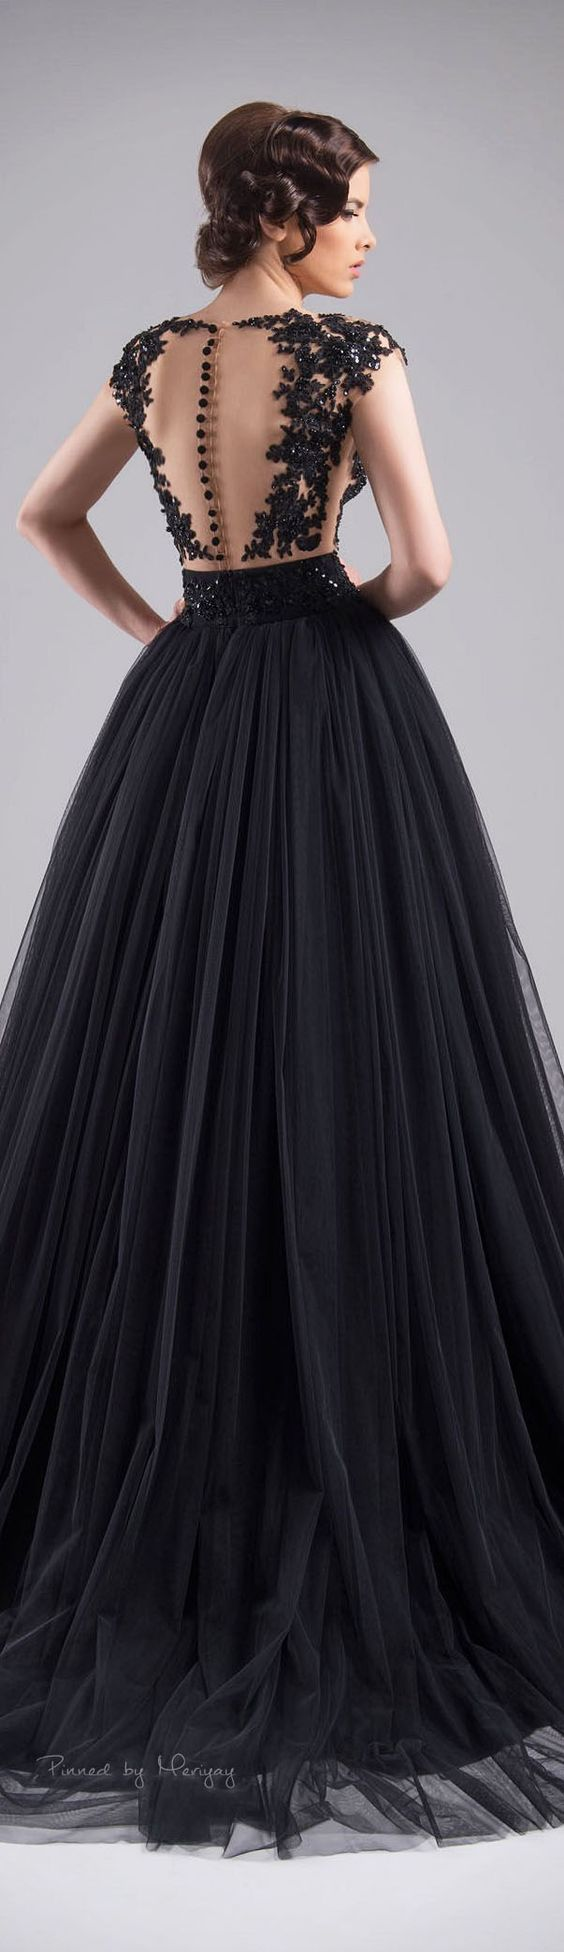 chernaya-svadba-11